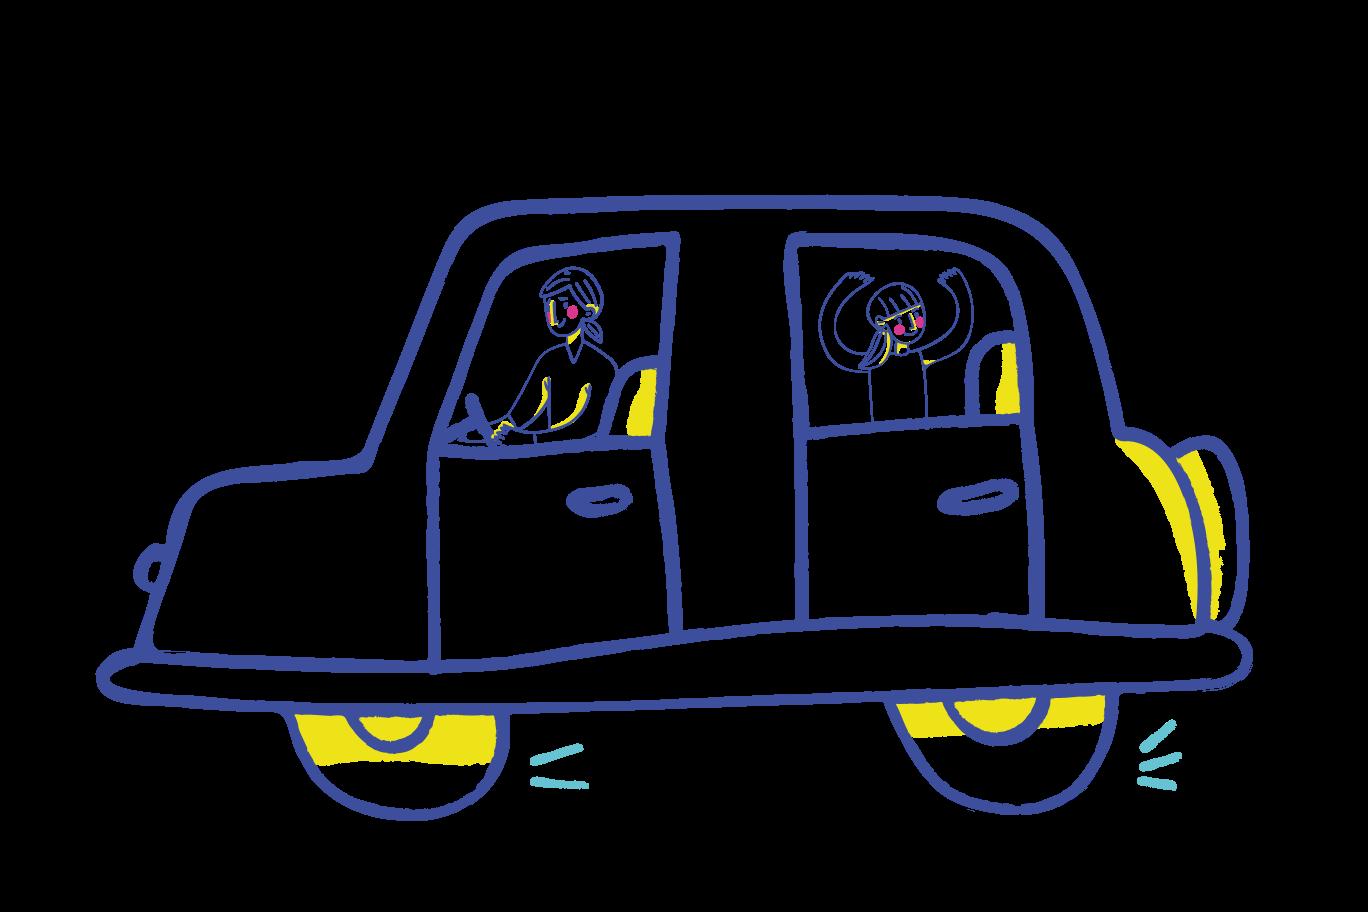 Roadtrip Clipart illustration in PNG, SVG